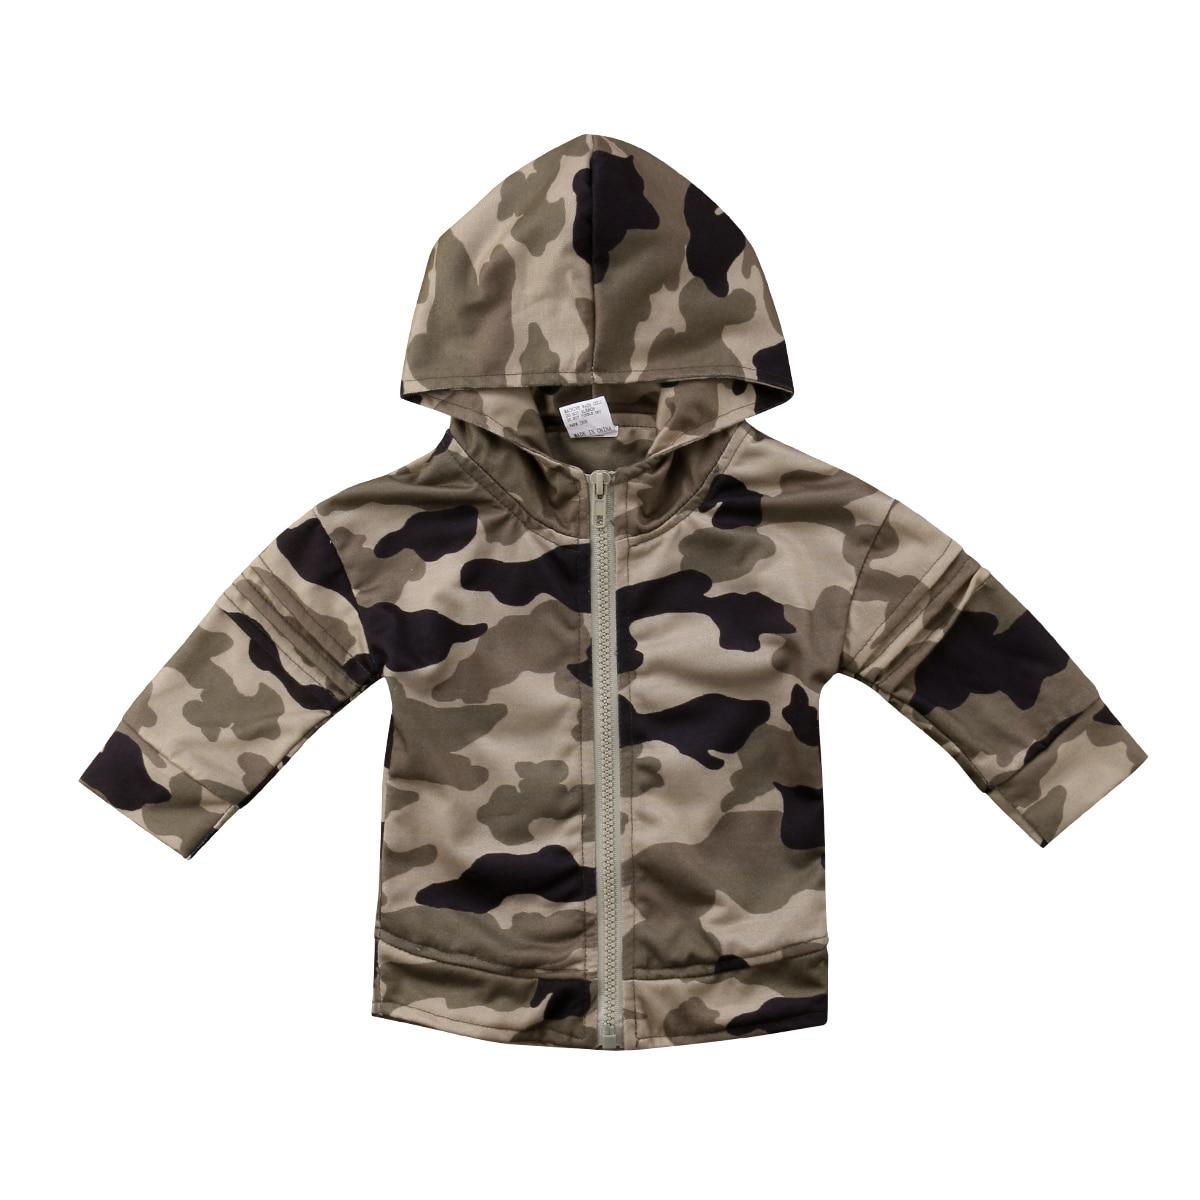 1-6 T Kinder Mit Kapuze Camo Mantel Kleidung Kleinkind Kinder Jungen Mädchen Lange Hülse Hoodie Tops Jacke Mäntel Kleidung Mild And Mellow